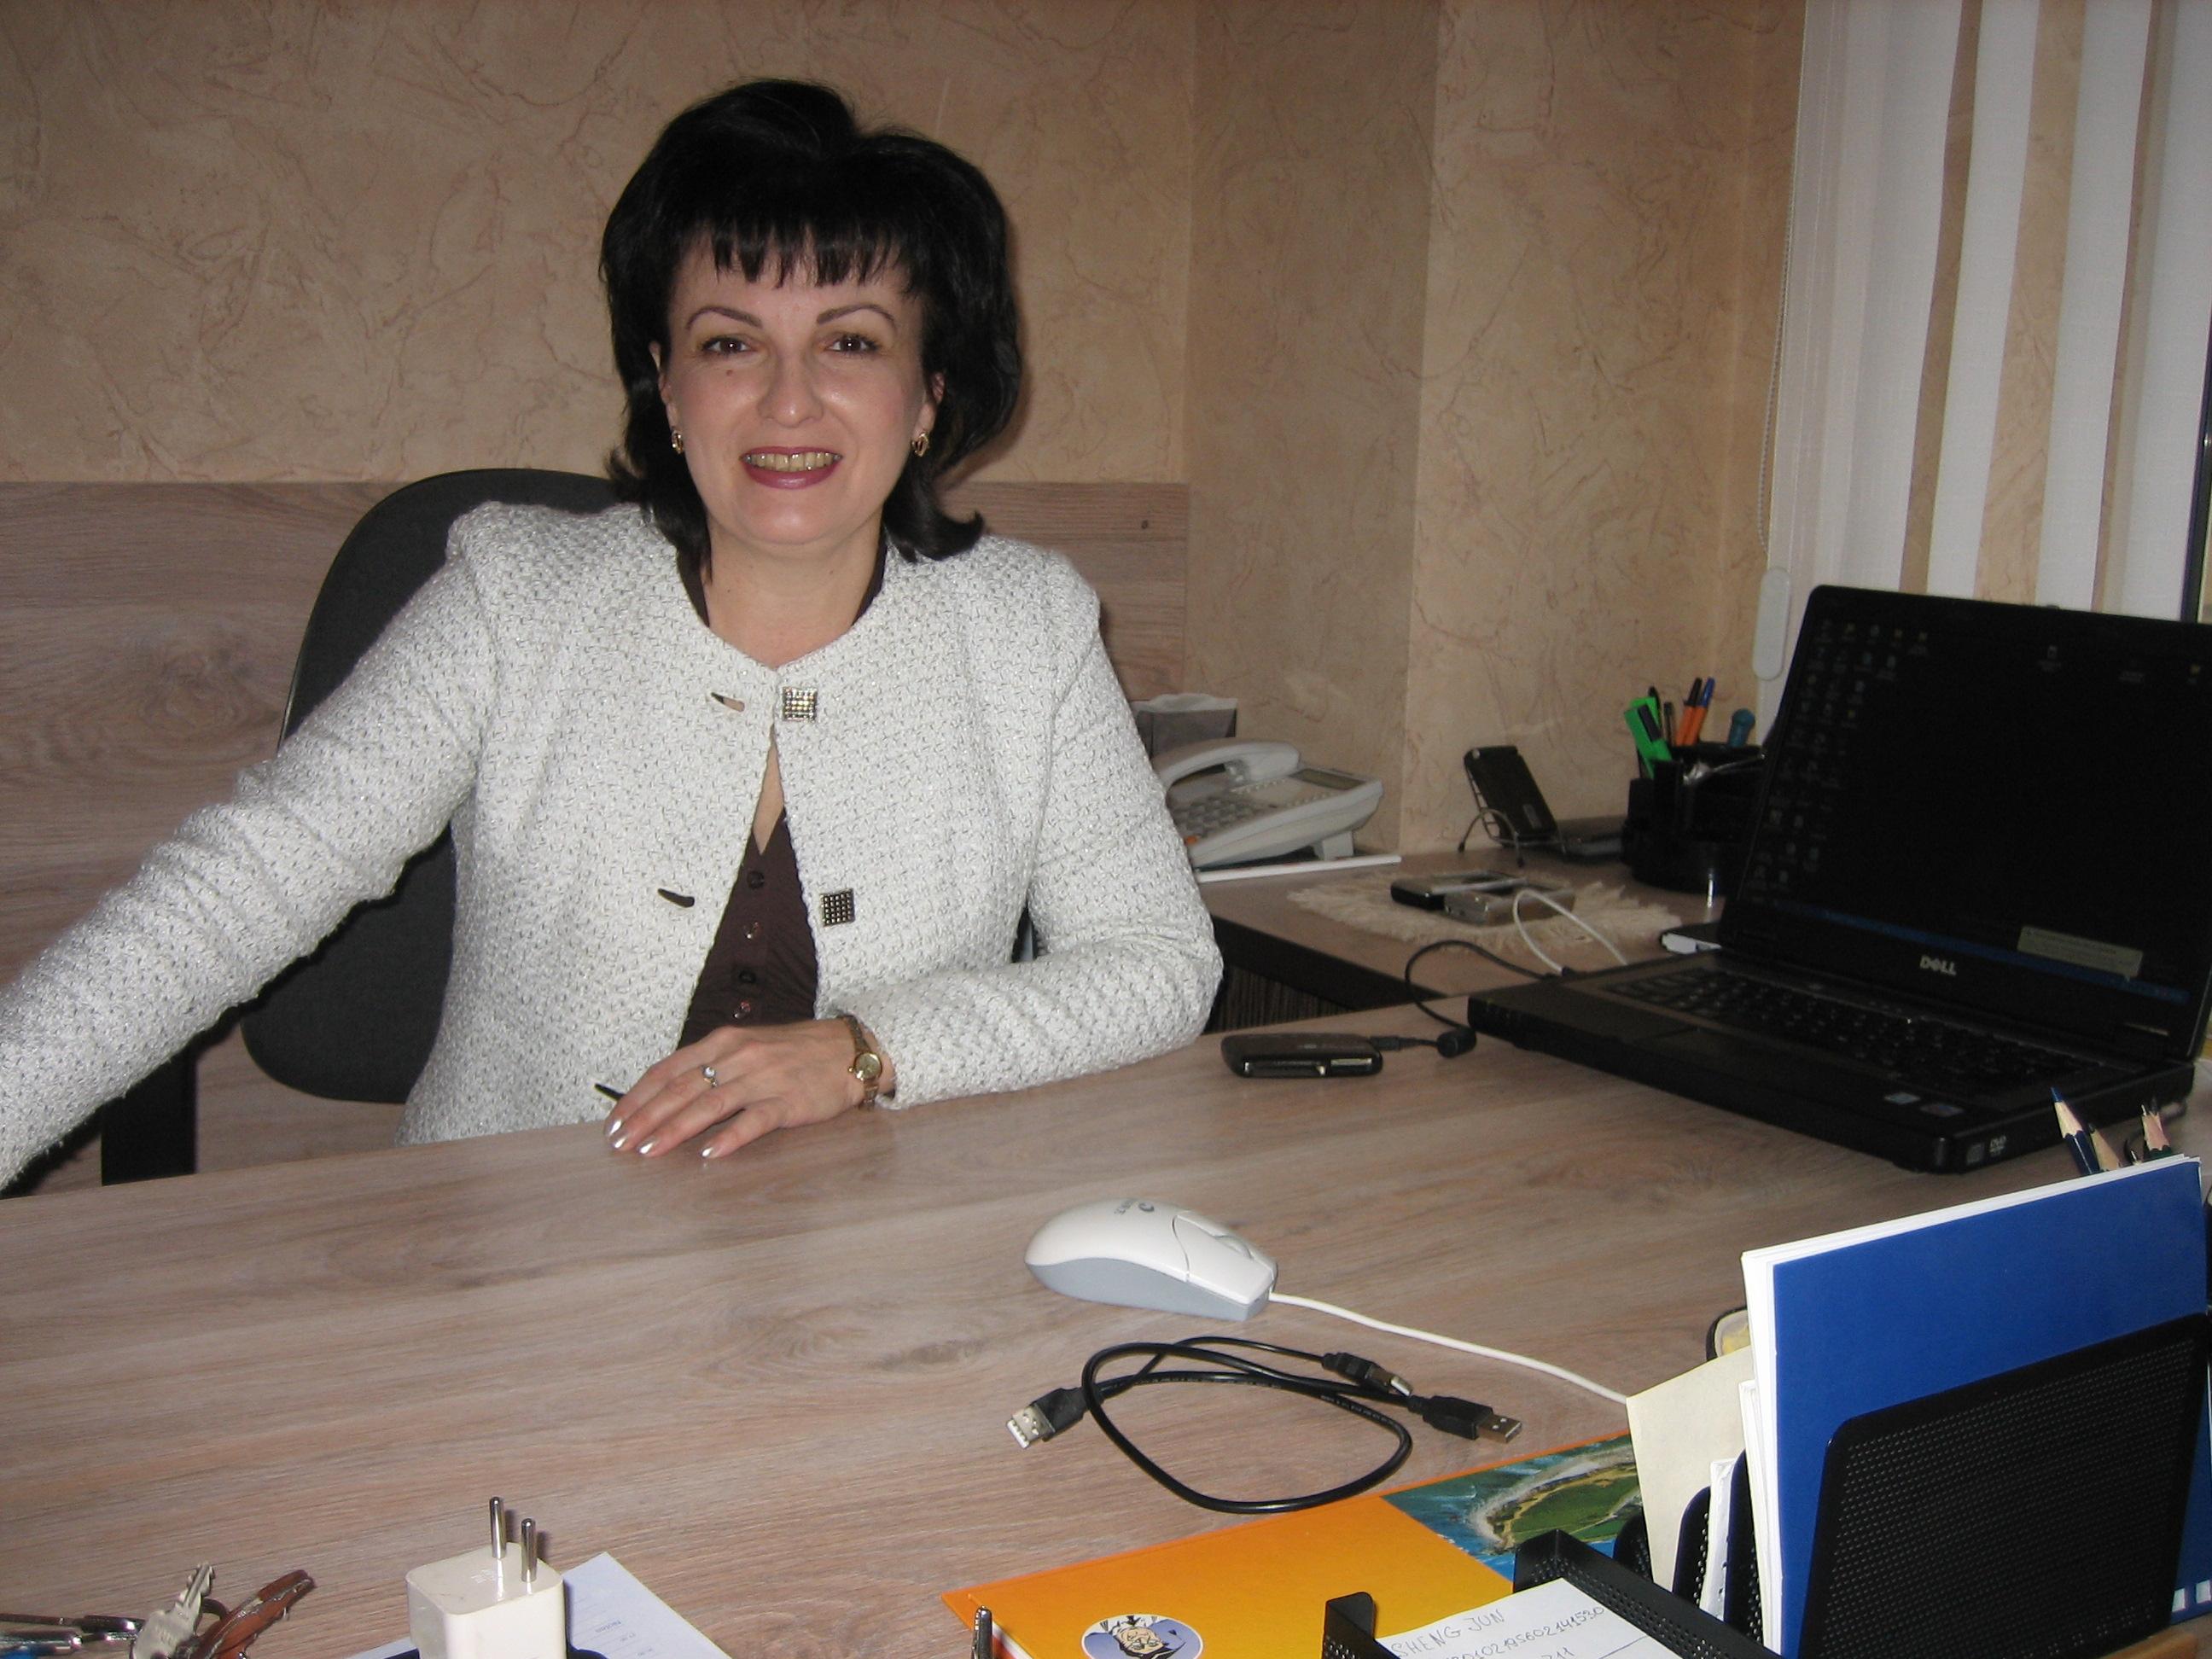 Тараканова татьяна анатольевна, Татьяна Анатольевна Тараканова(Сыченикова) 21 фотография